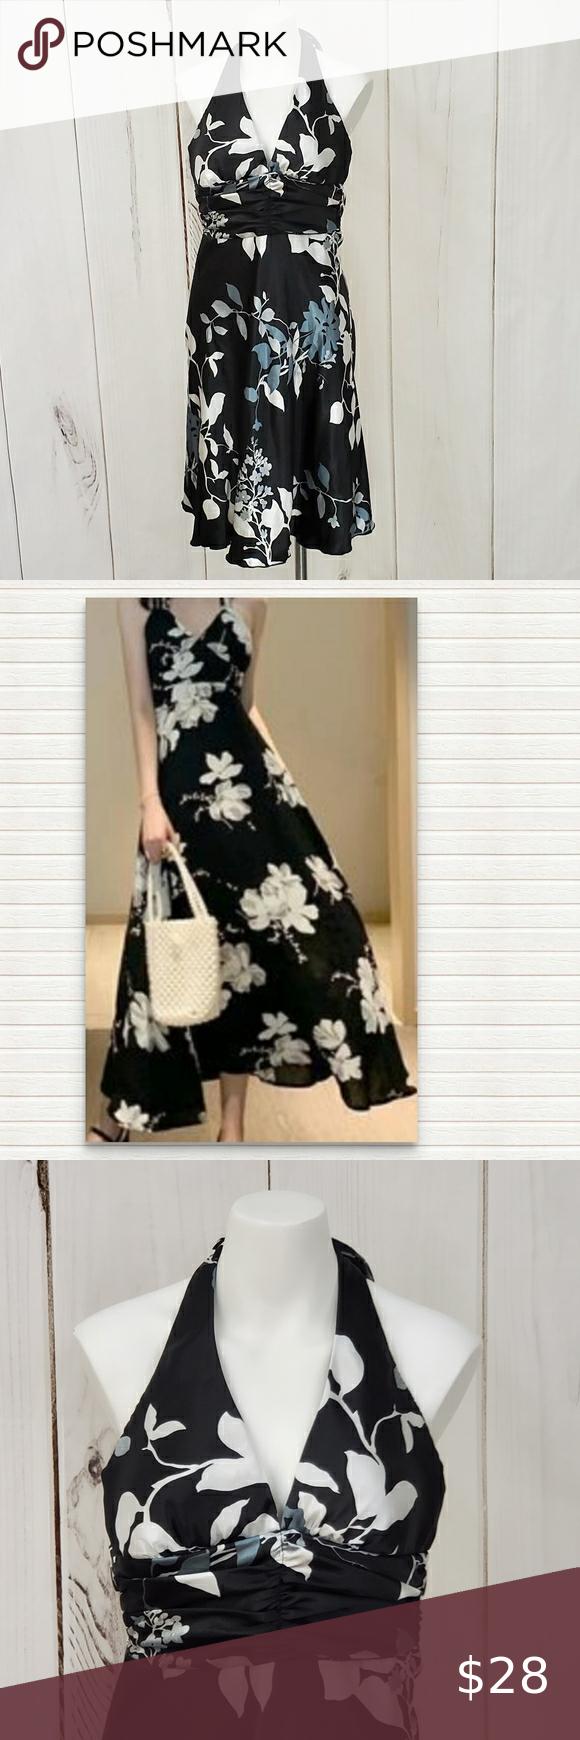 Last Chance Speechless Dress Juniors Black Floral Speechless Dress Junior Dresses Dresses [ 1740 x 580 Pixel ]